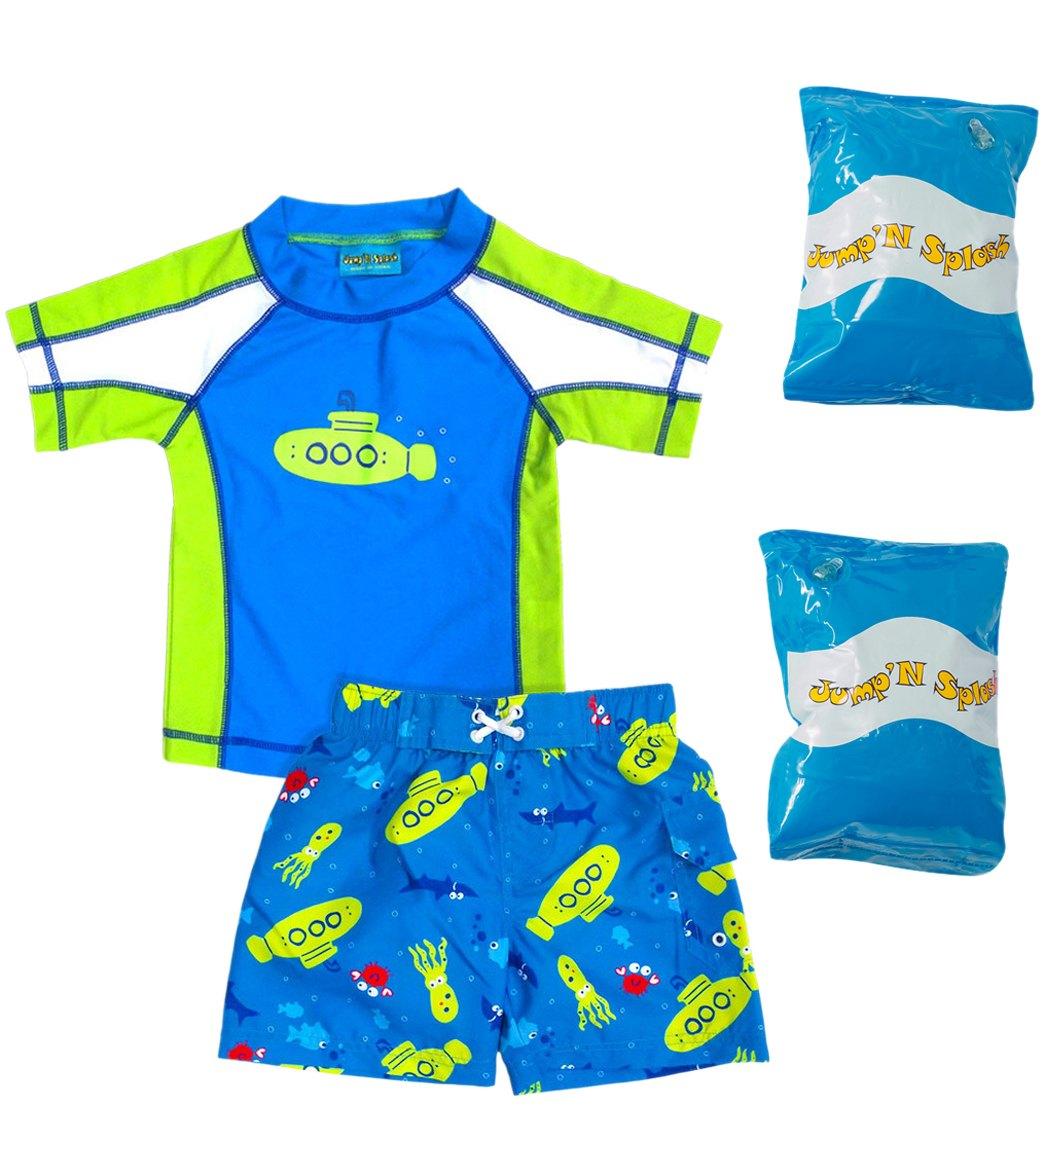 a632c47488 Jump N Splash Toddler Boy's Submerge Two-Piece Rashguard Set w/ Free  Floaties (2T-3T)